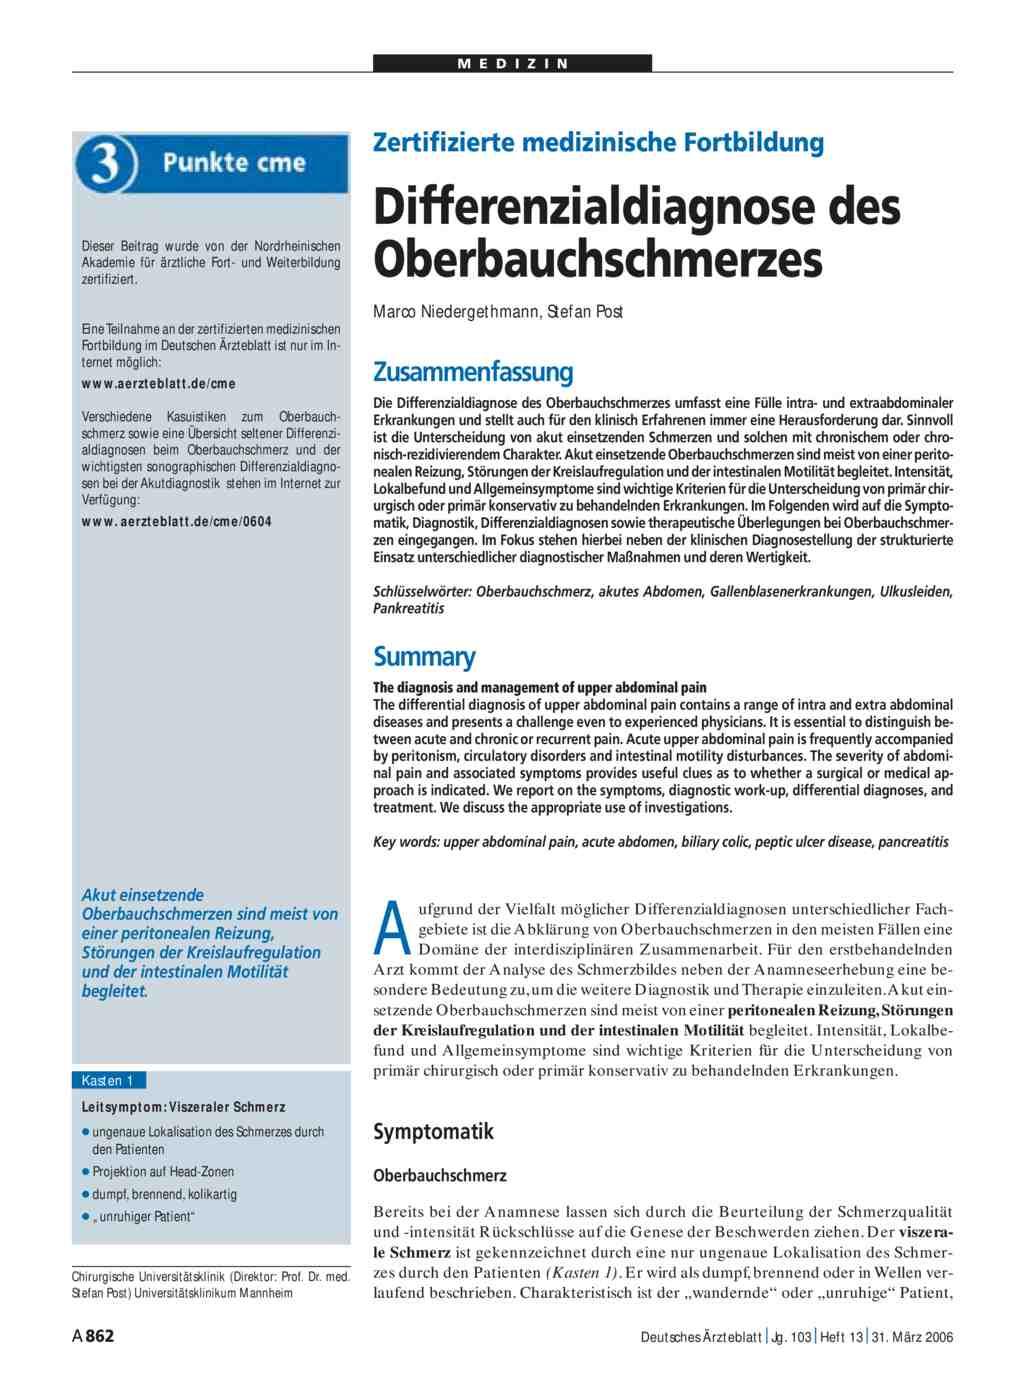 Zertifizierte Medizinische Fortbildung Differenzialdiagnose